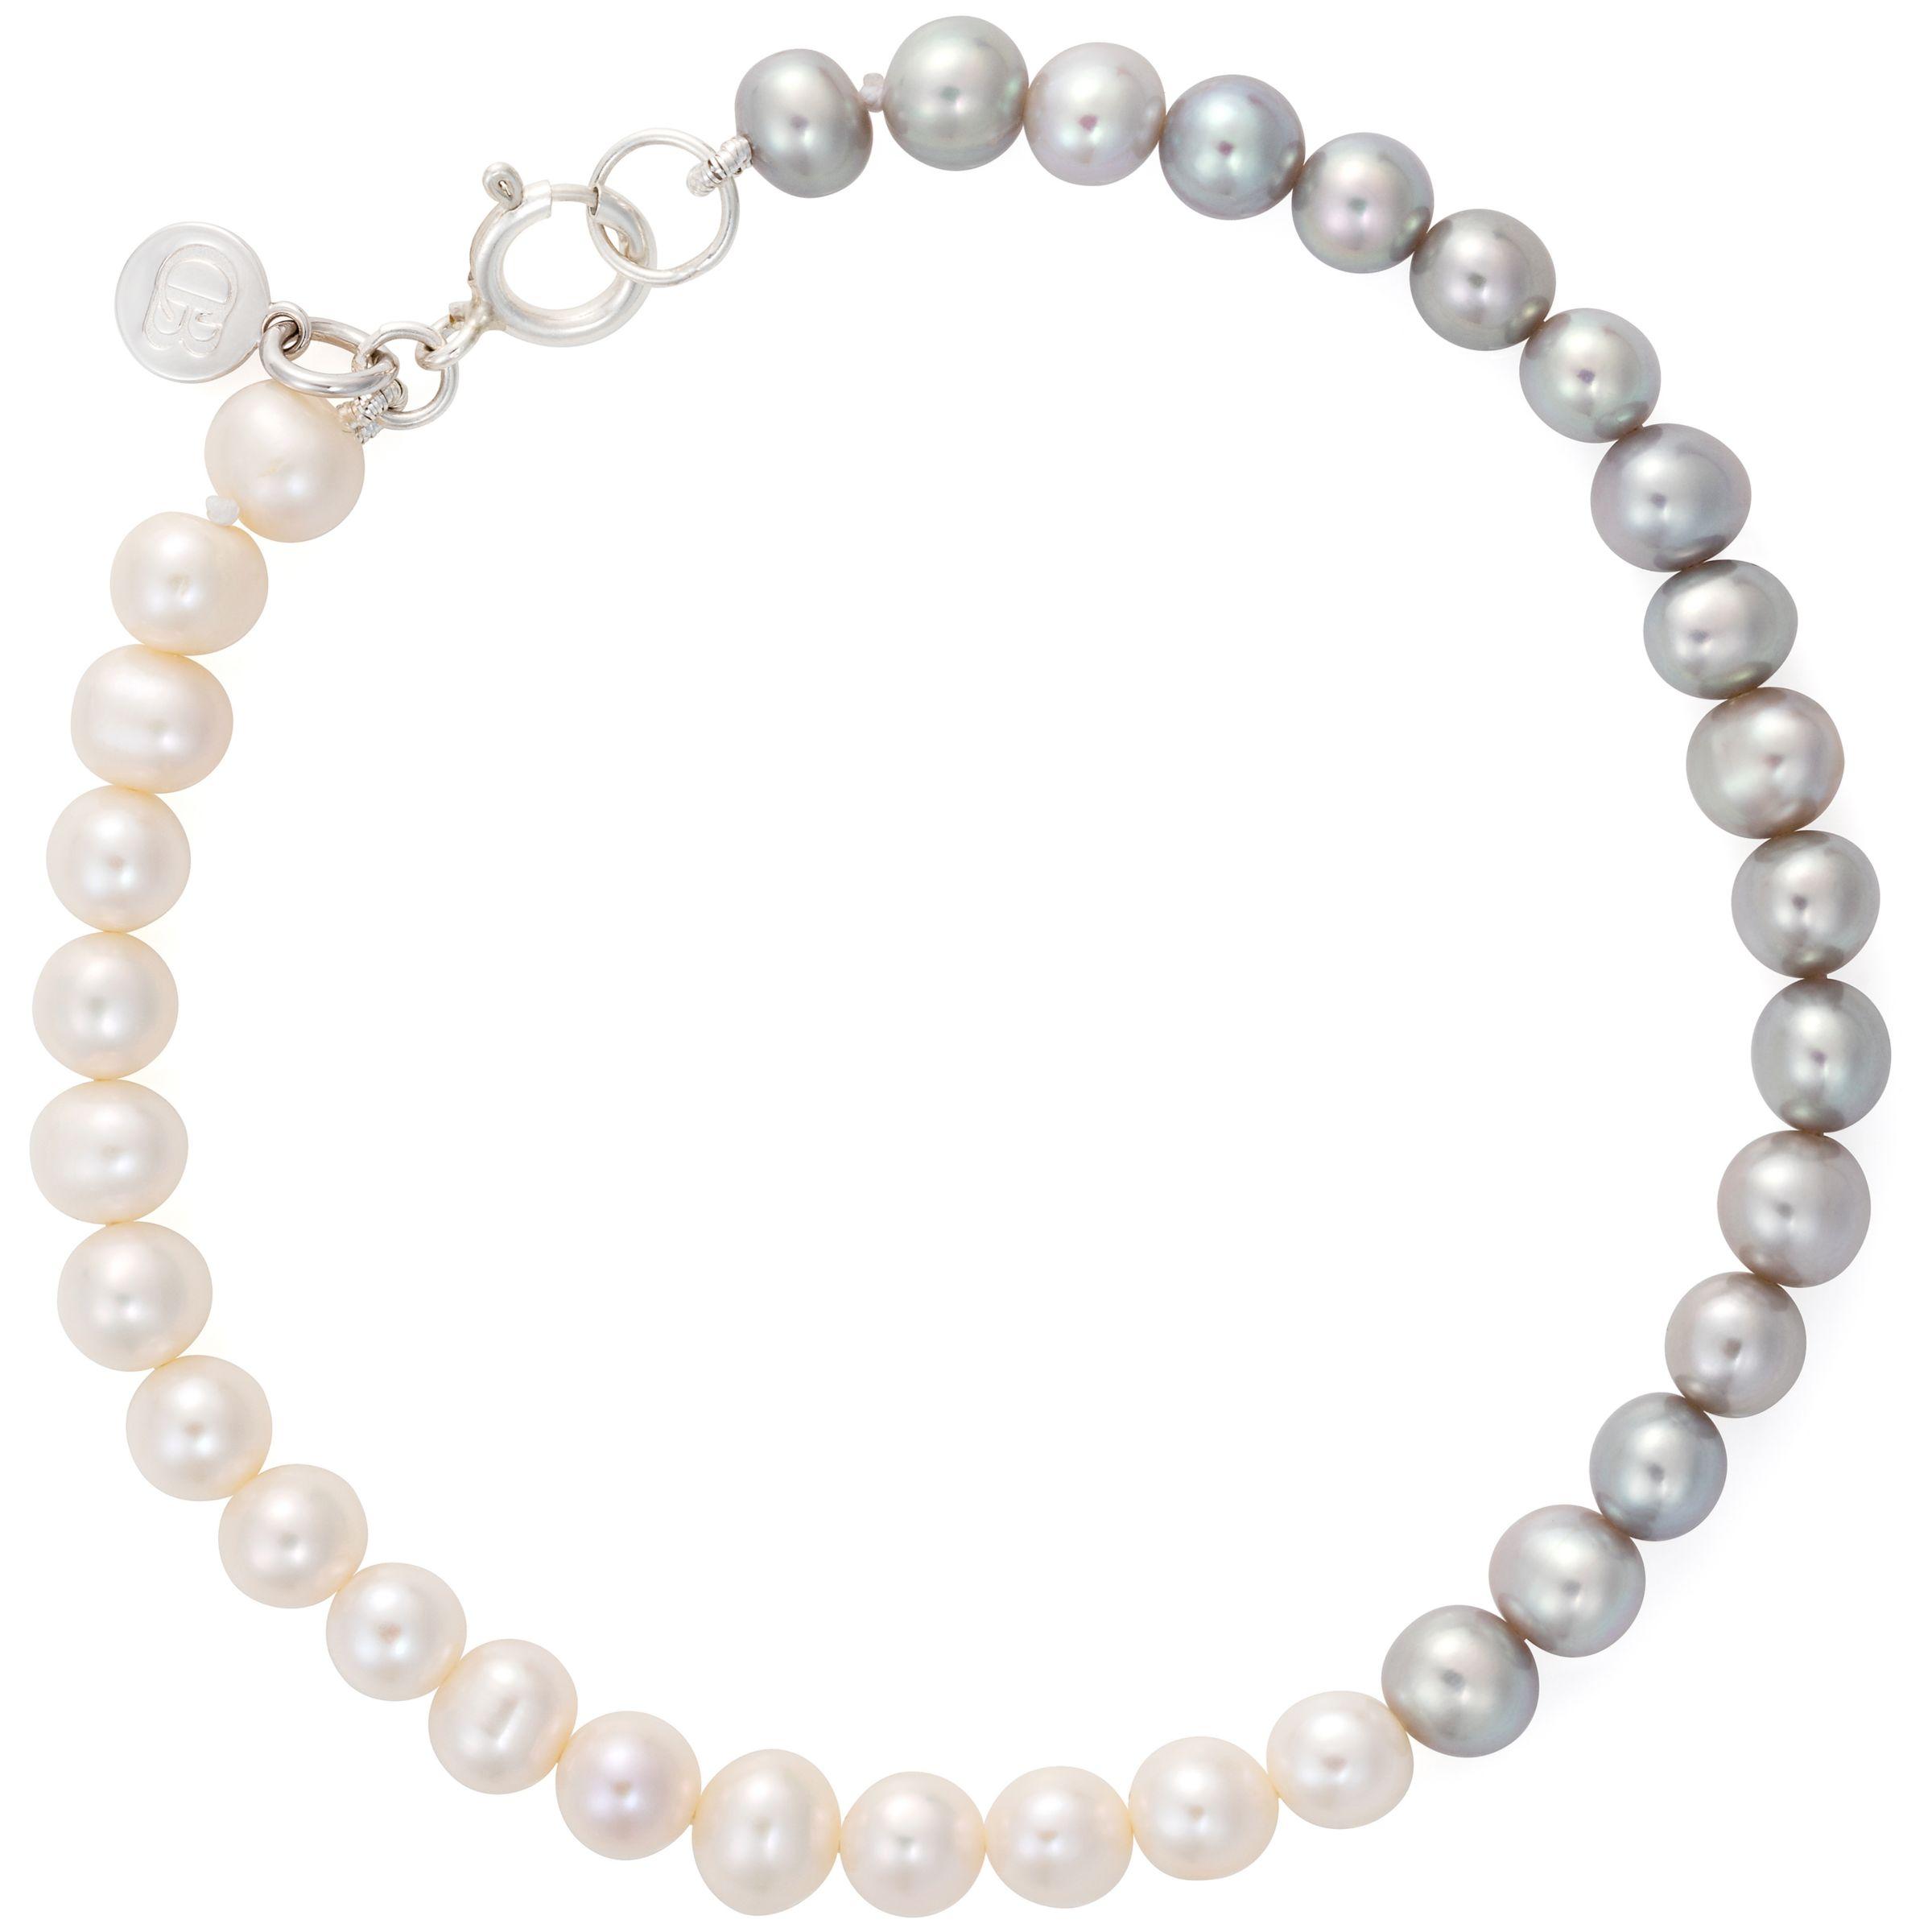 Claudia Bradby Claudia Bradby Freshwater Pearl Ombre Single Strand Bracelet, Silver/White